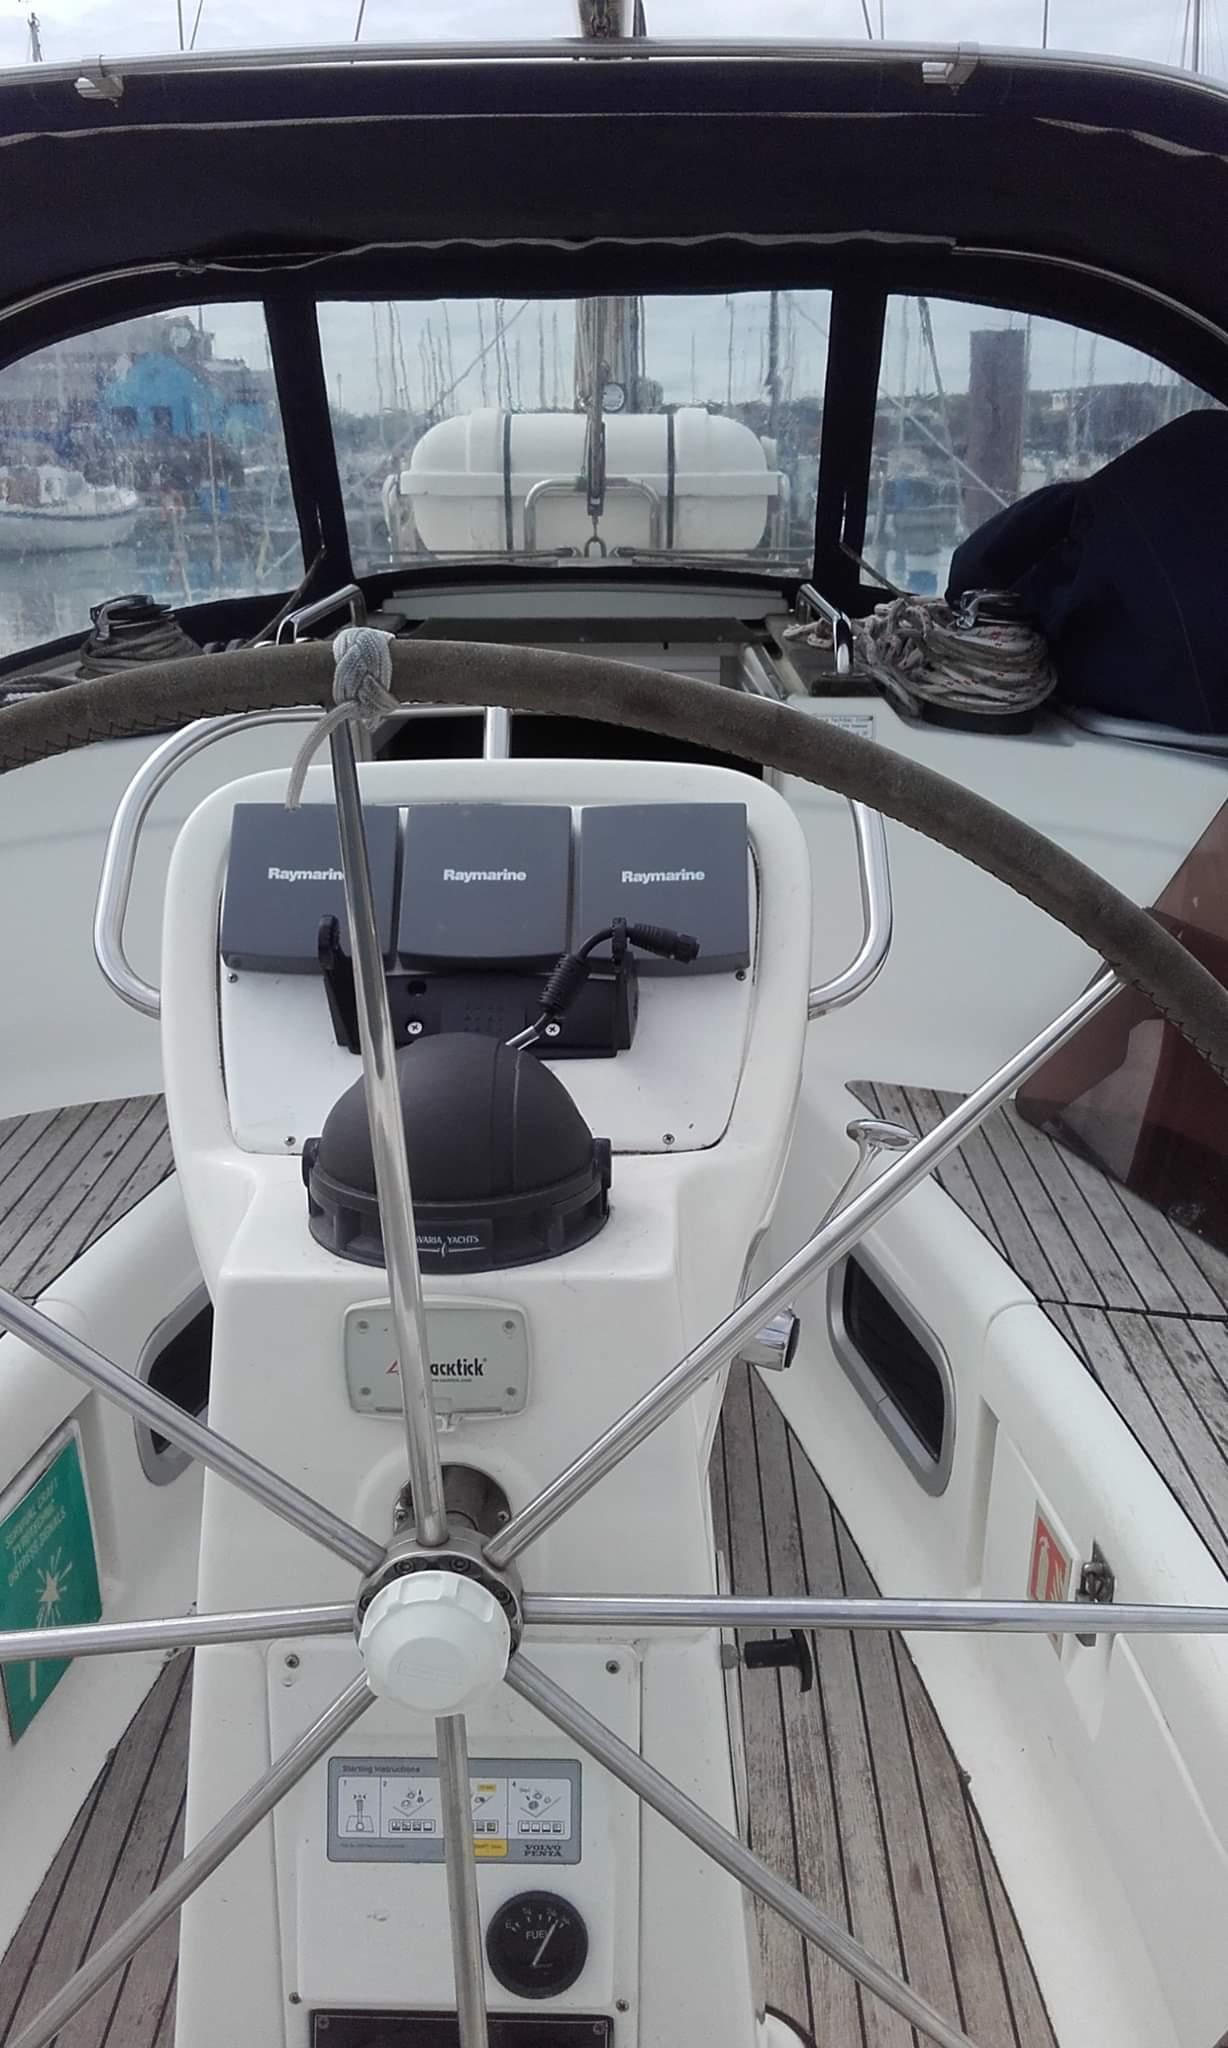 Bavaria 38 Solway Adventurer - Yacht for charter instruments